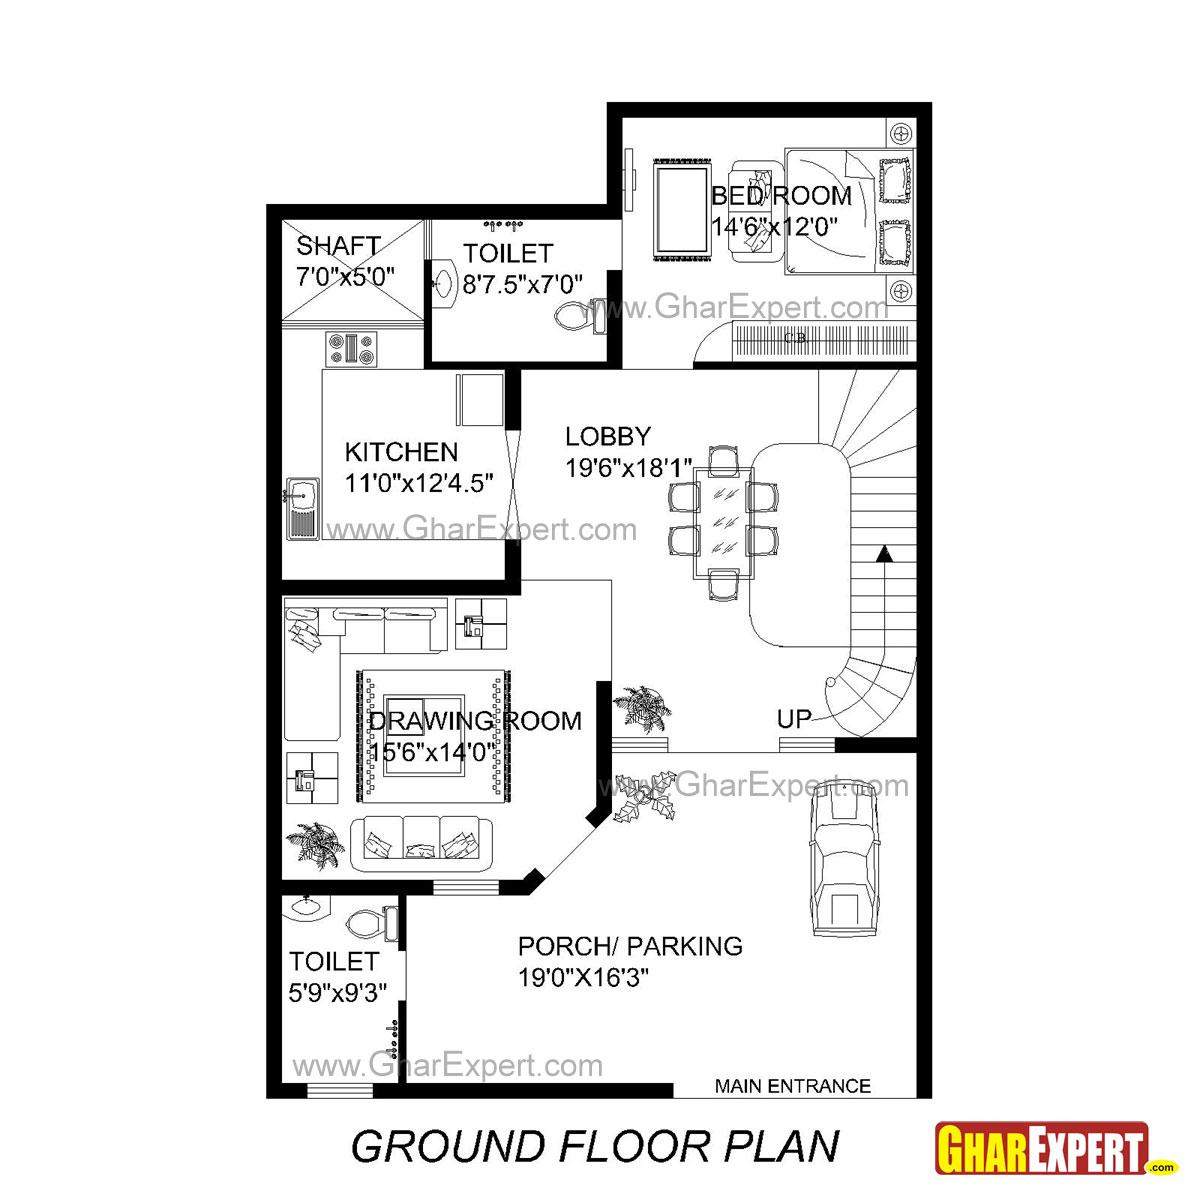 House Plan for 33 Feet by 49 Feet plot (Plot Size 170